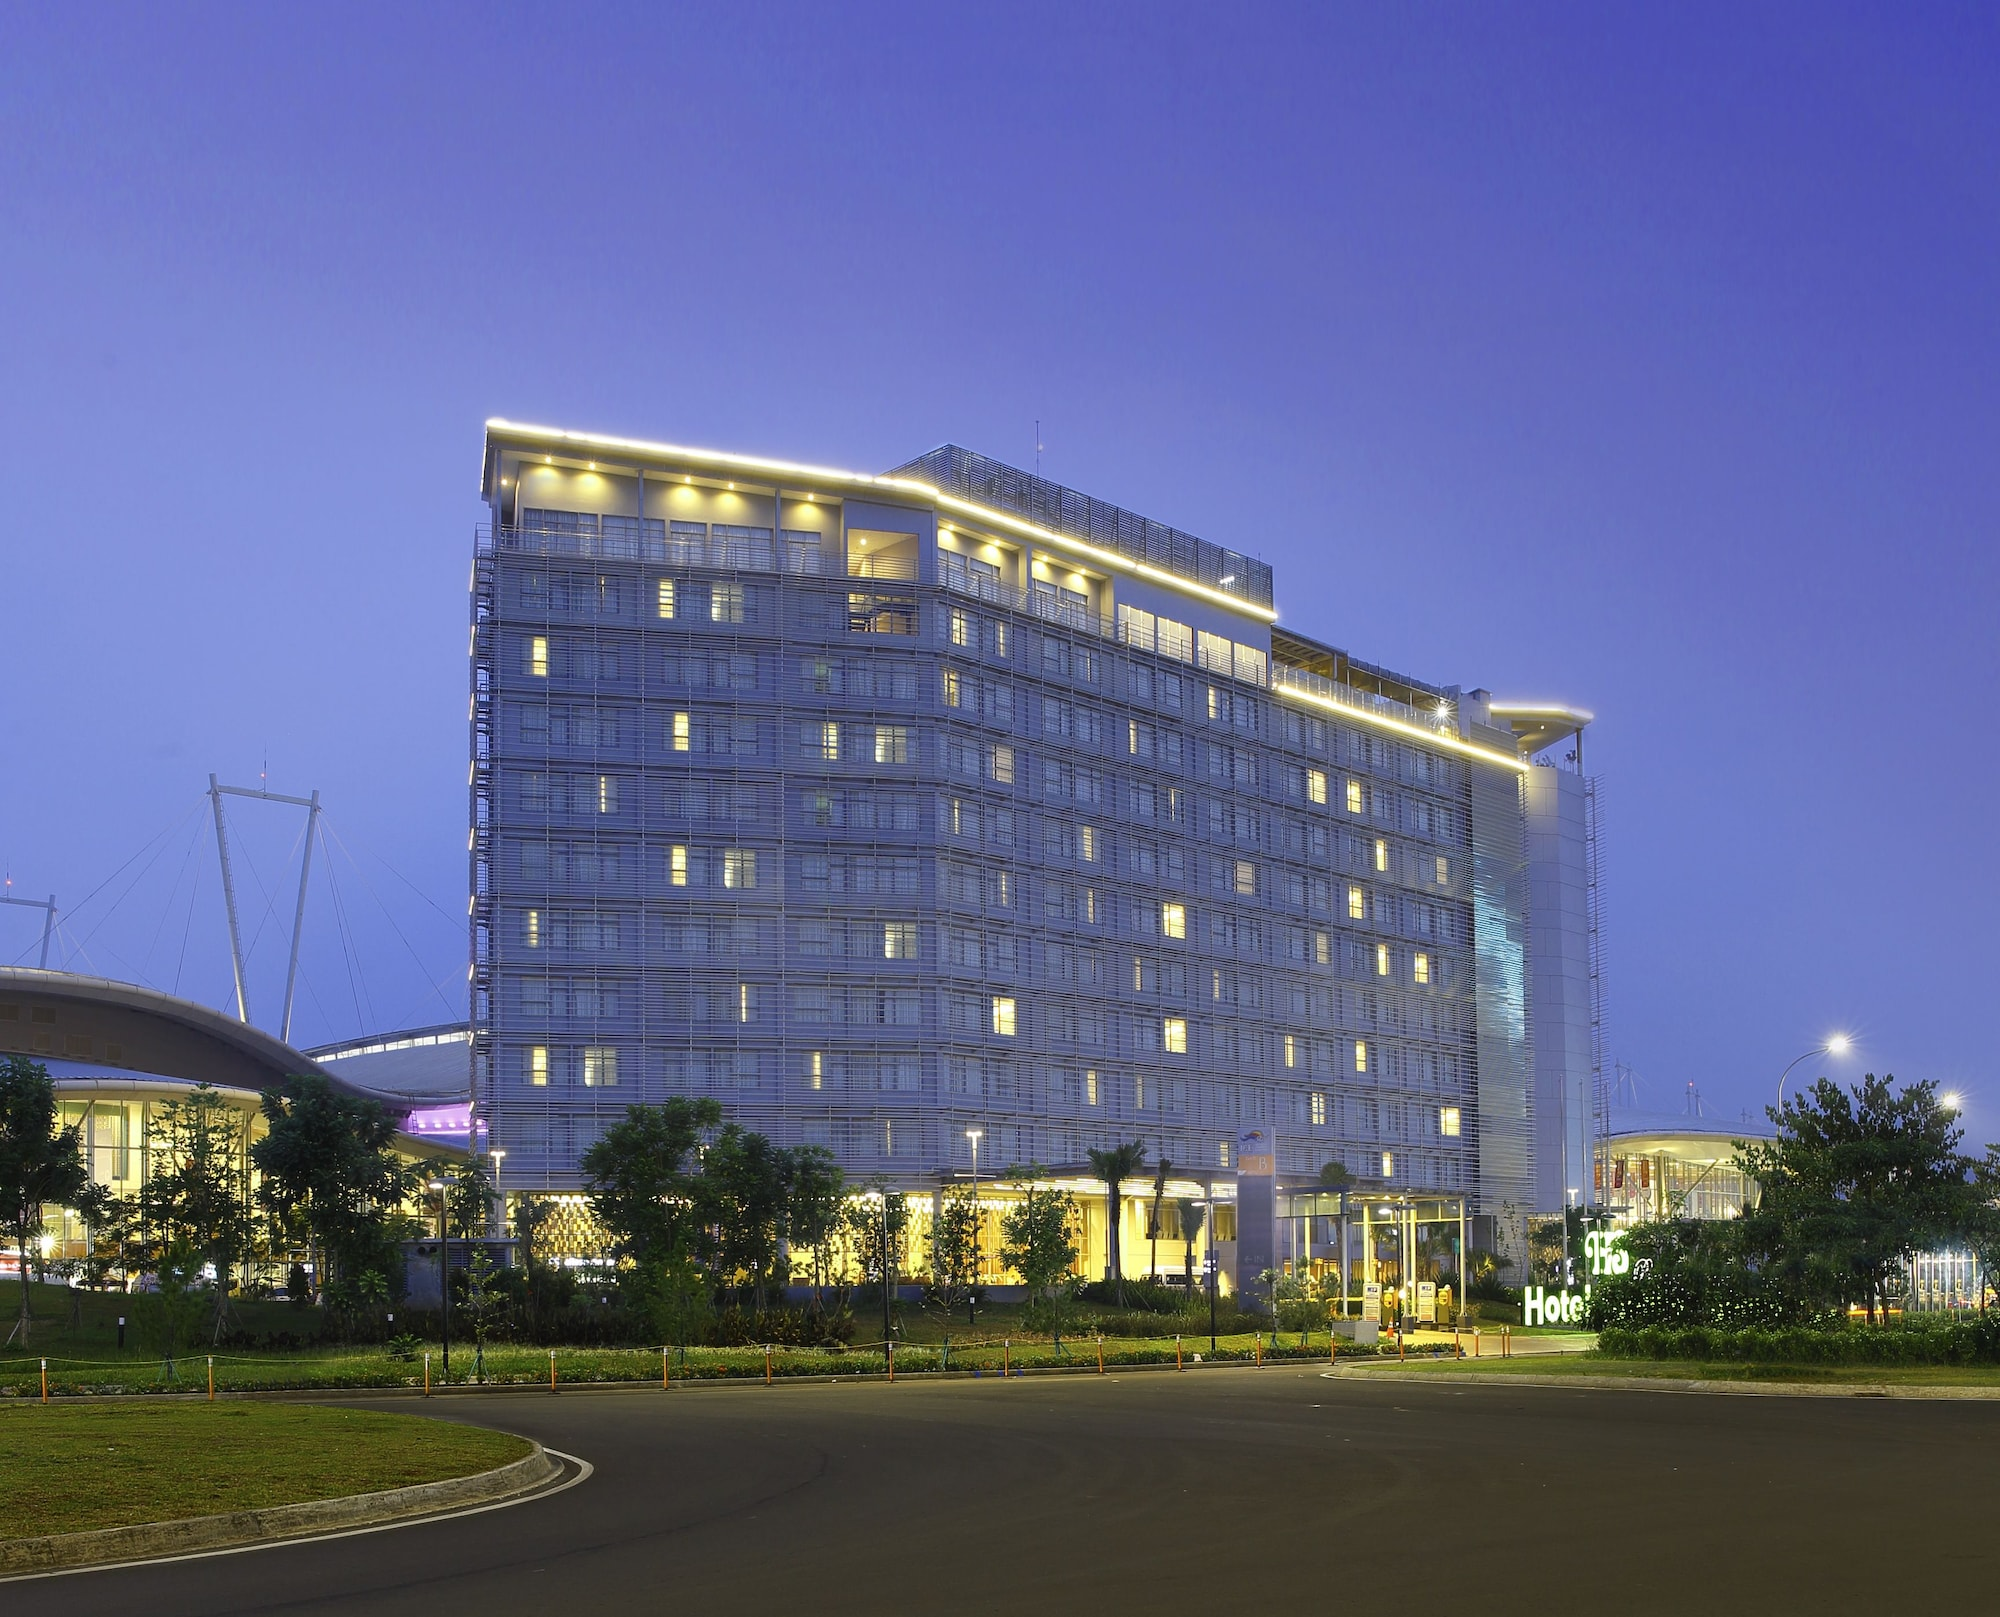 Hotel Santika Premiere ICE - BSD City, Tangerang